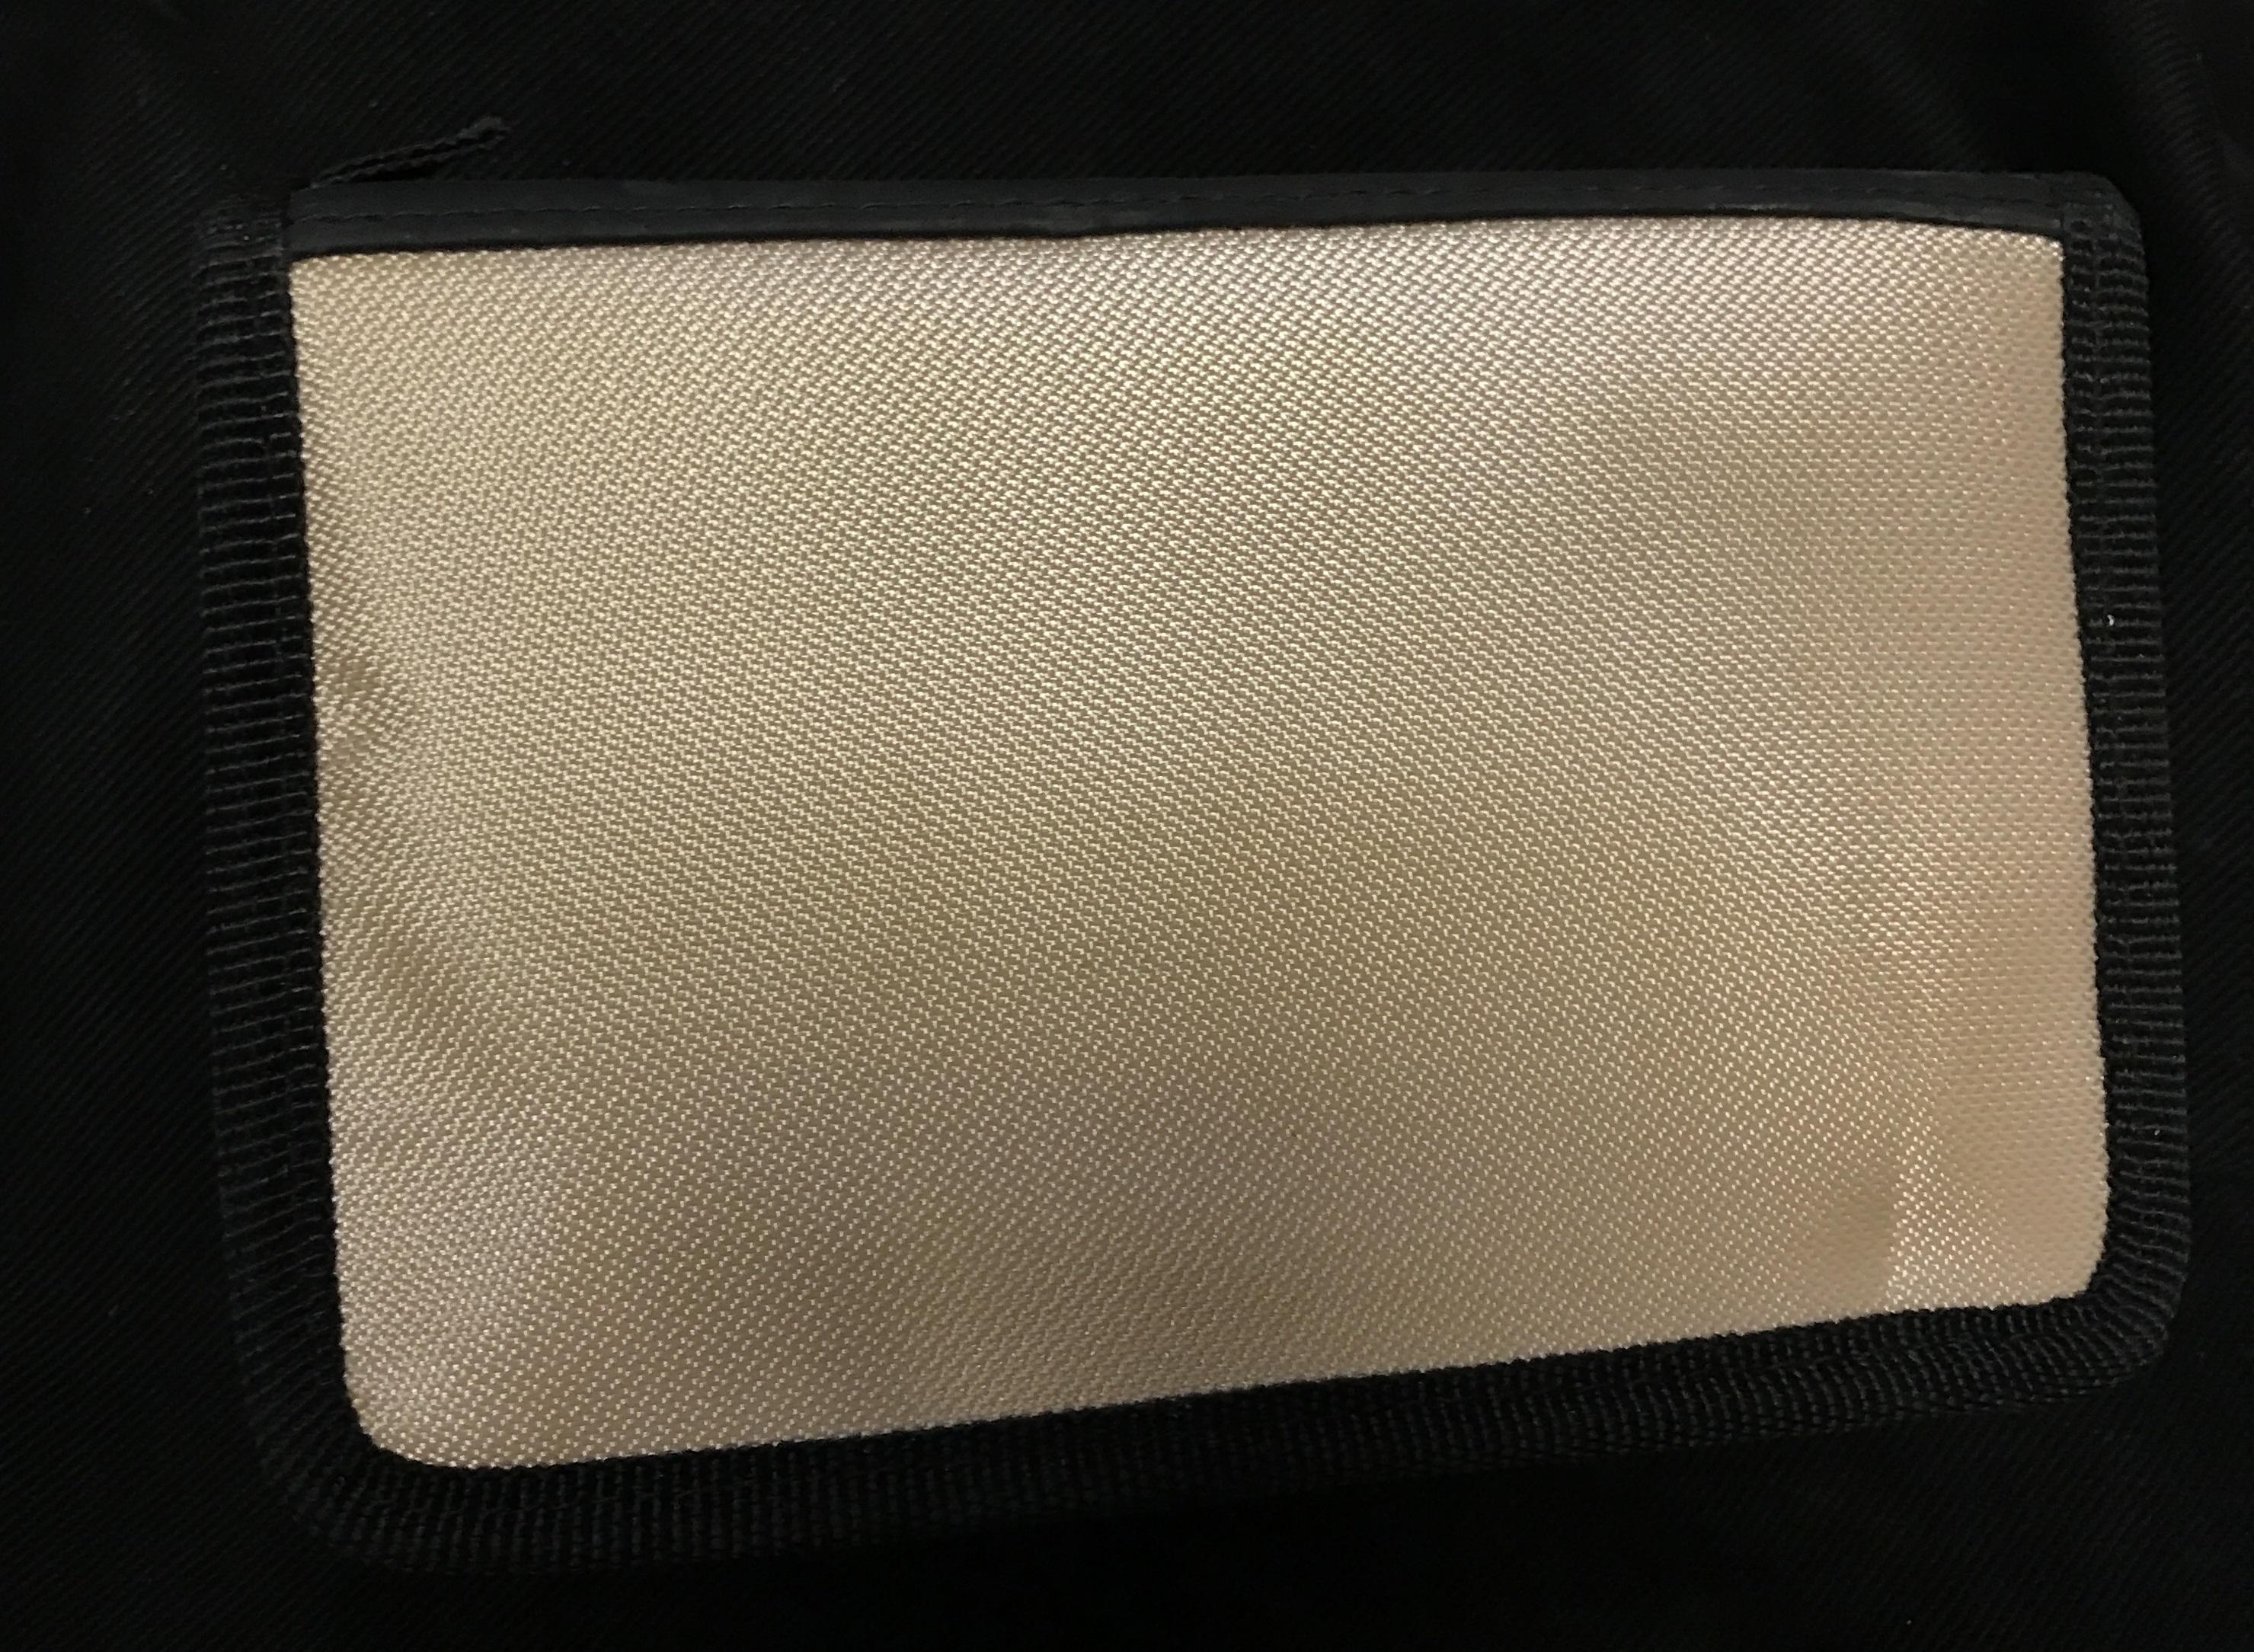 Nintendo DS Pouch Case - Beige